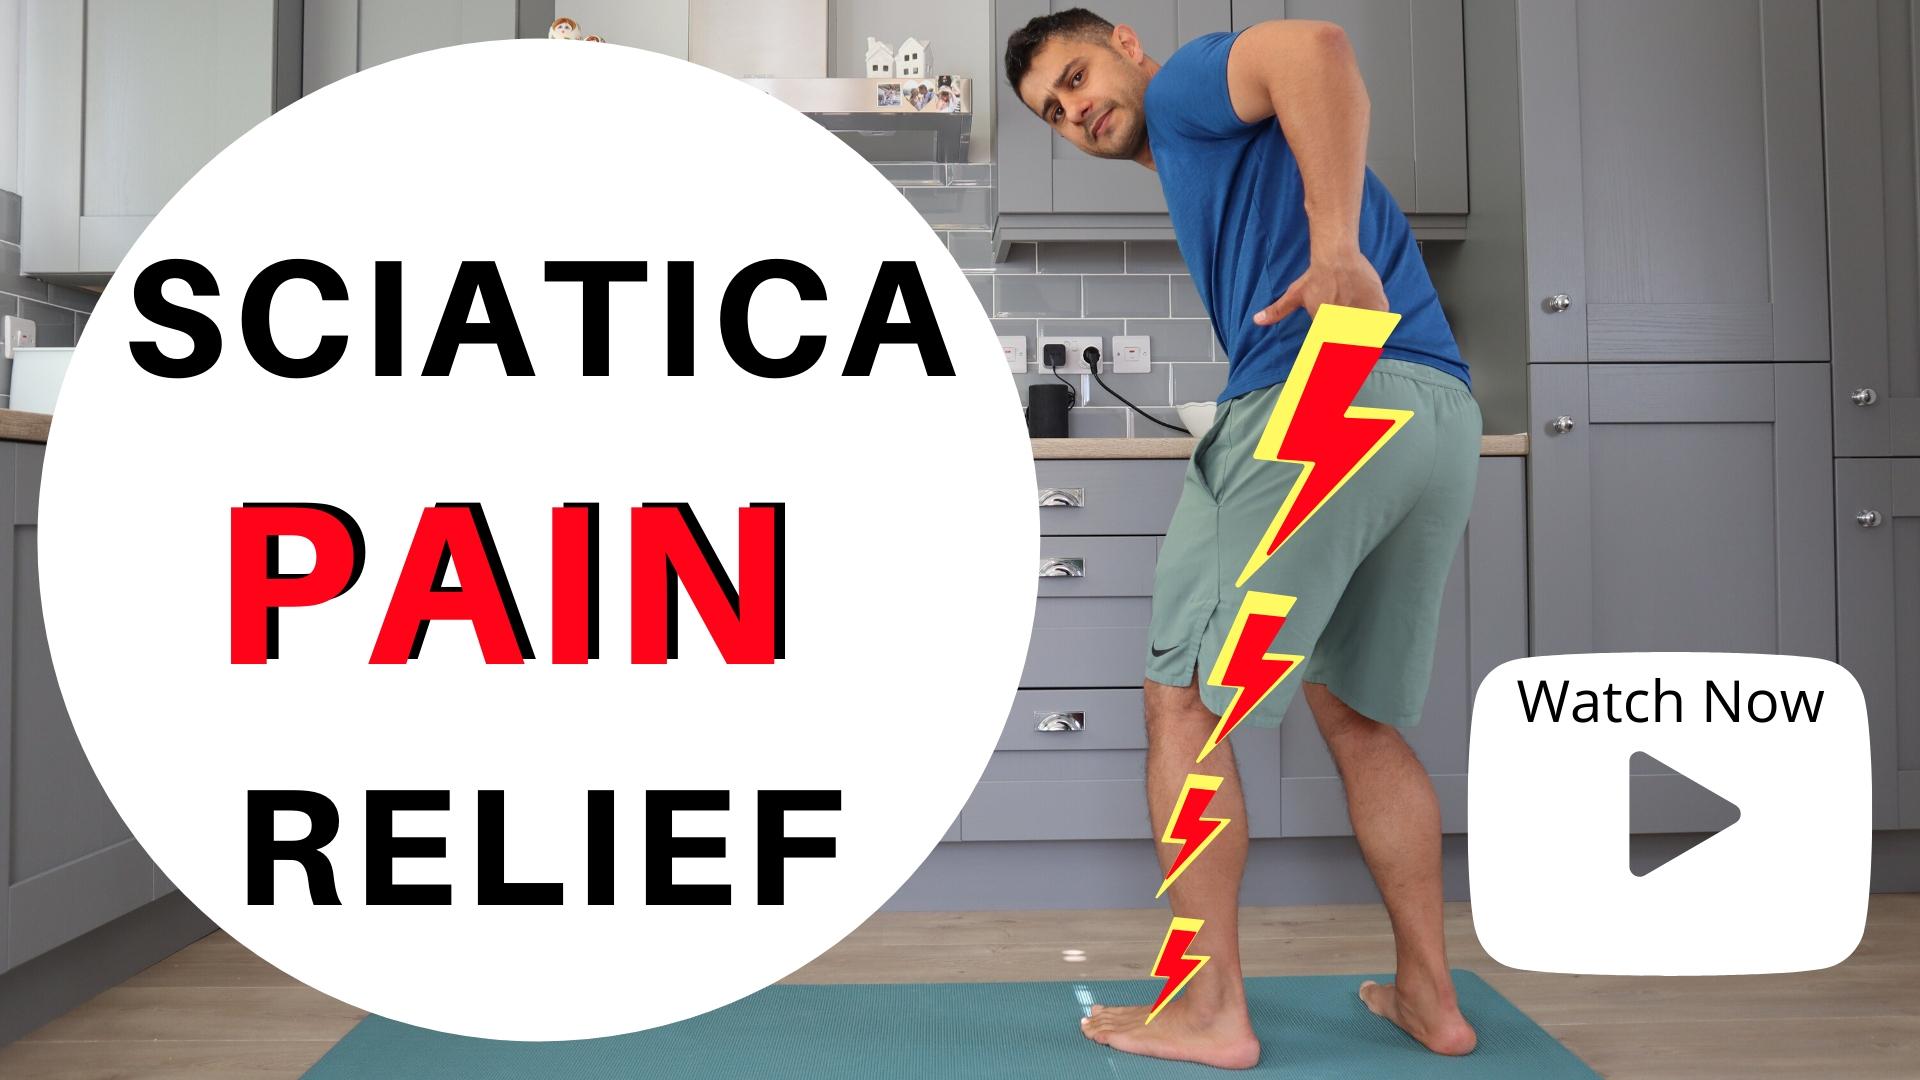 TOP EXERCISES FOR SCIATICA PAIN RELIEF